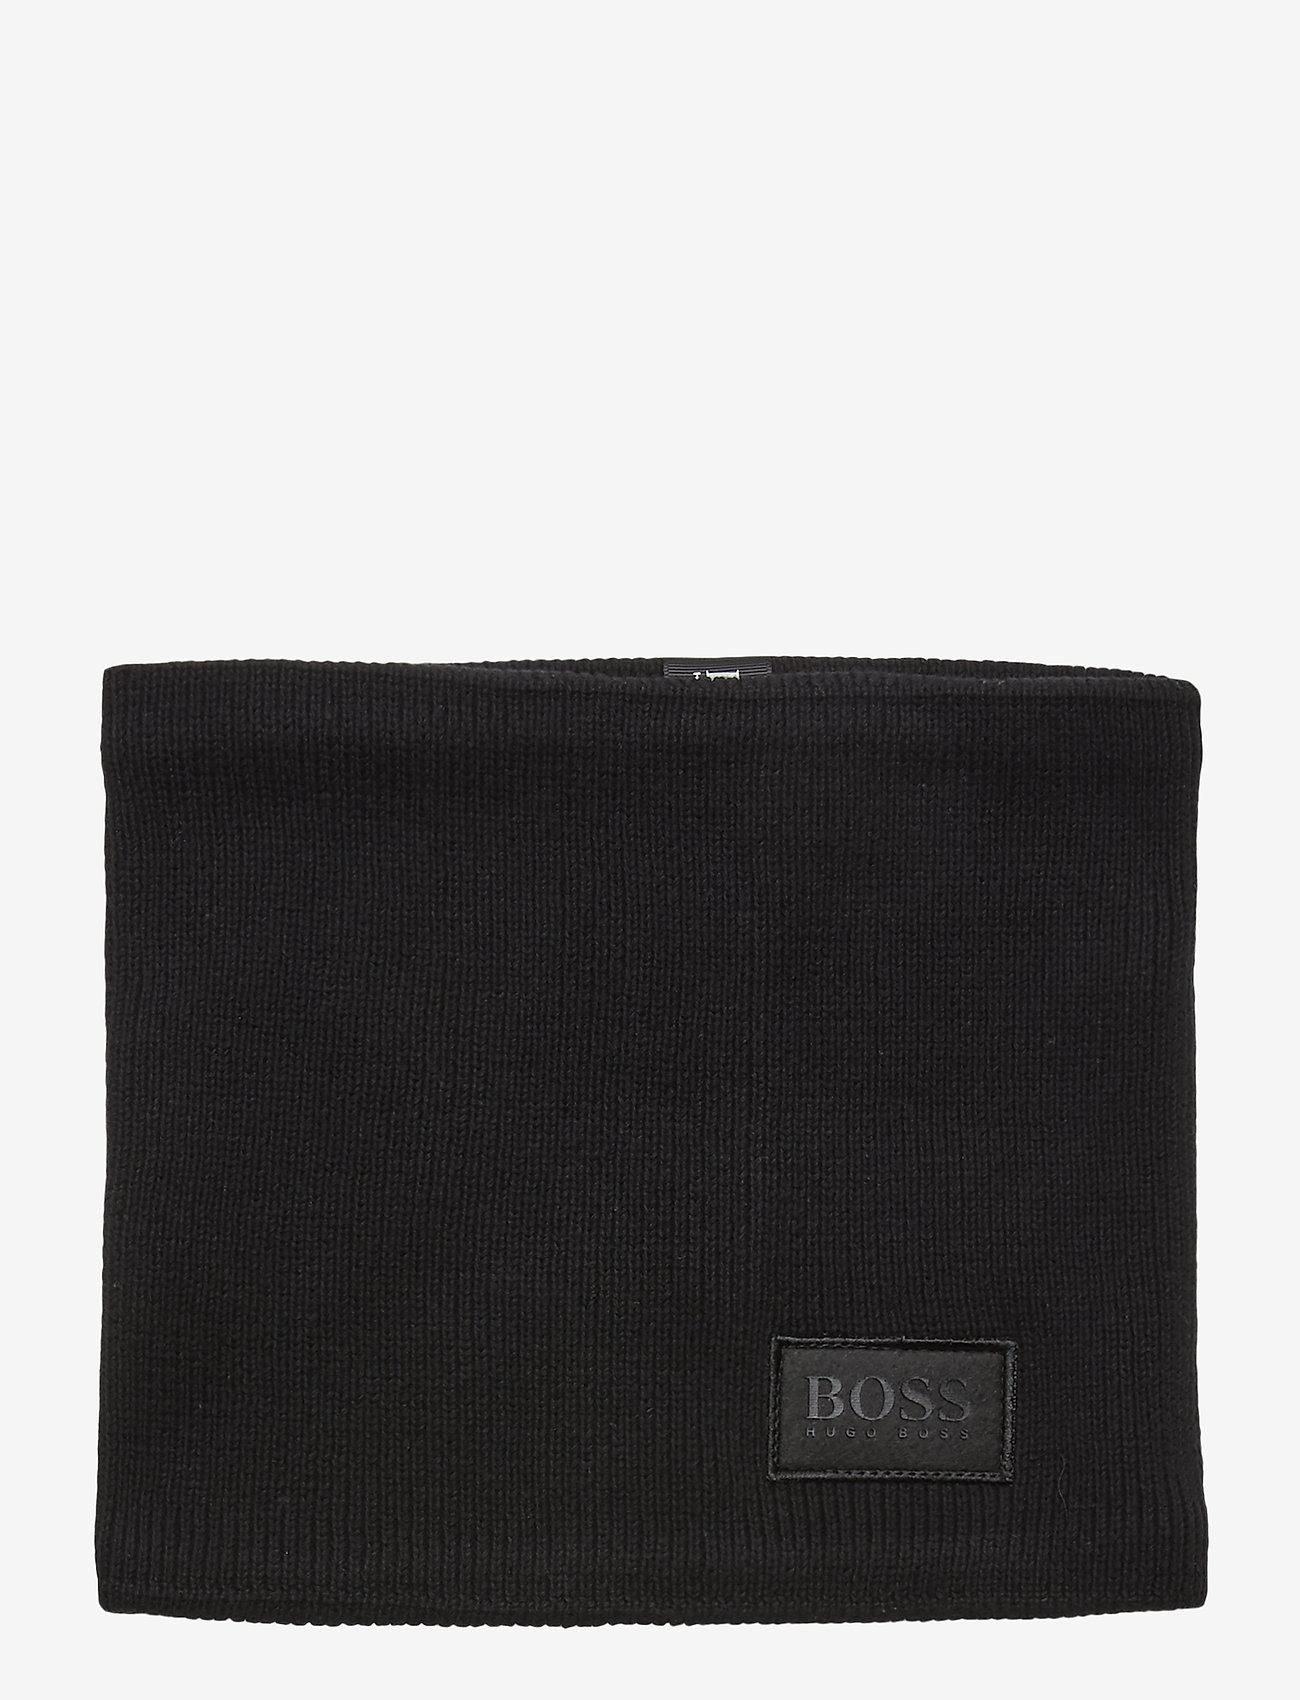 BOSS - SNOOD - winterkleding - black - 1